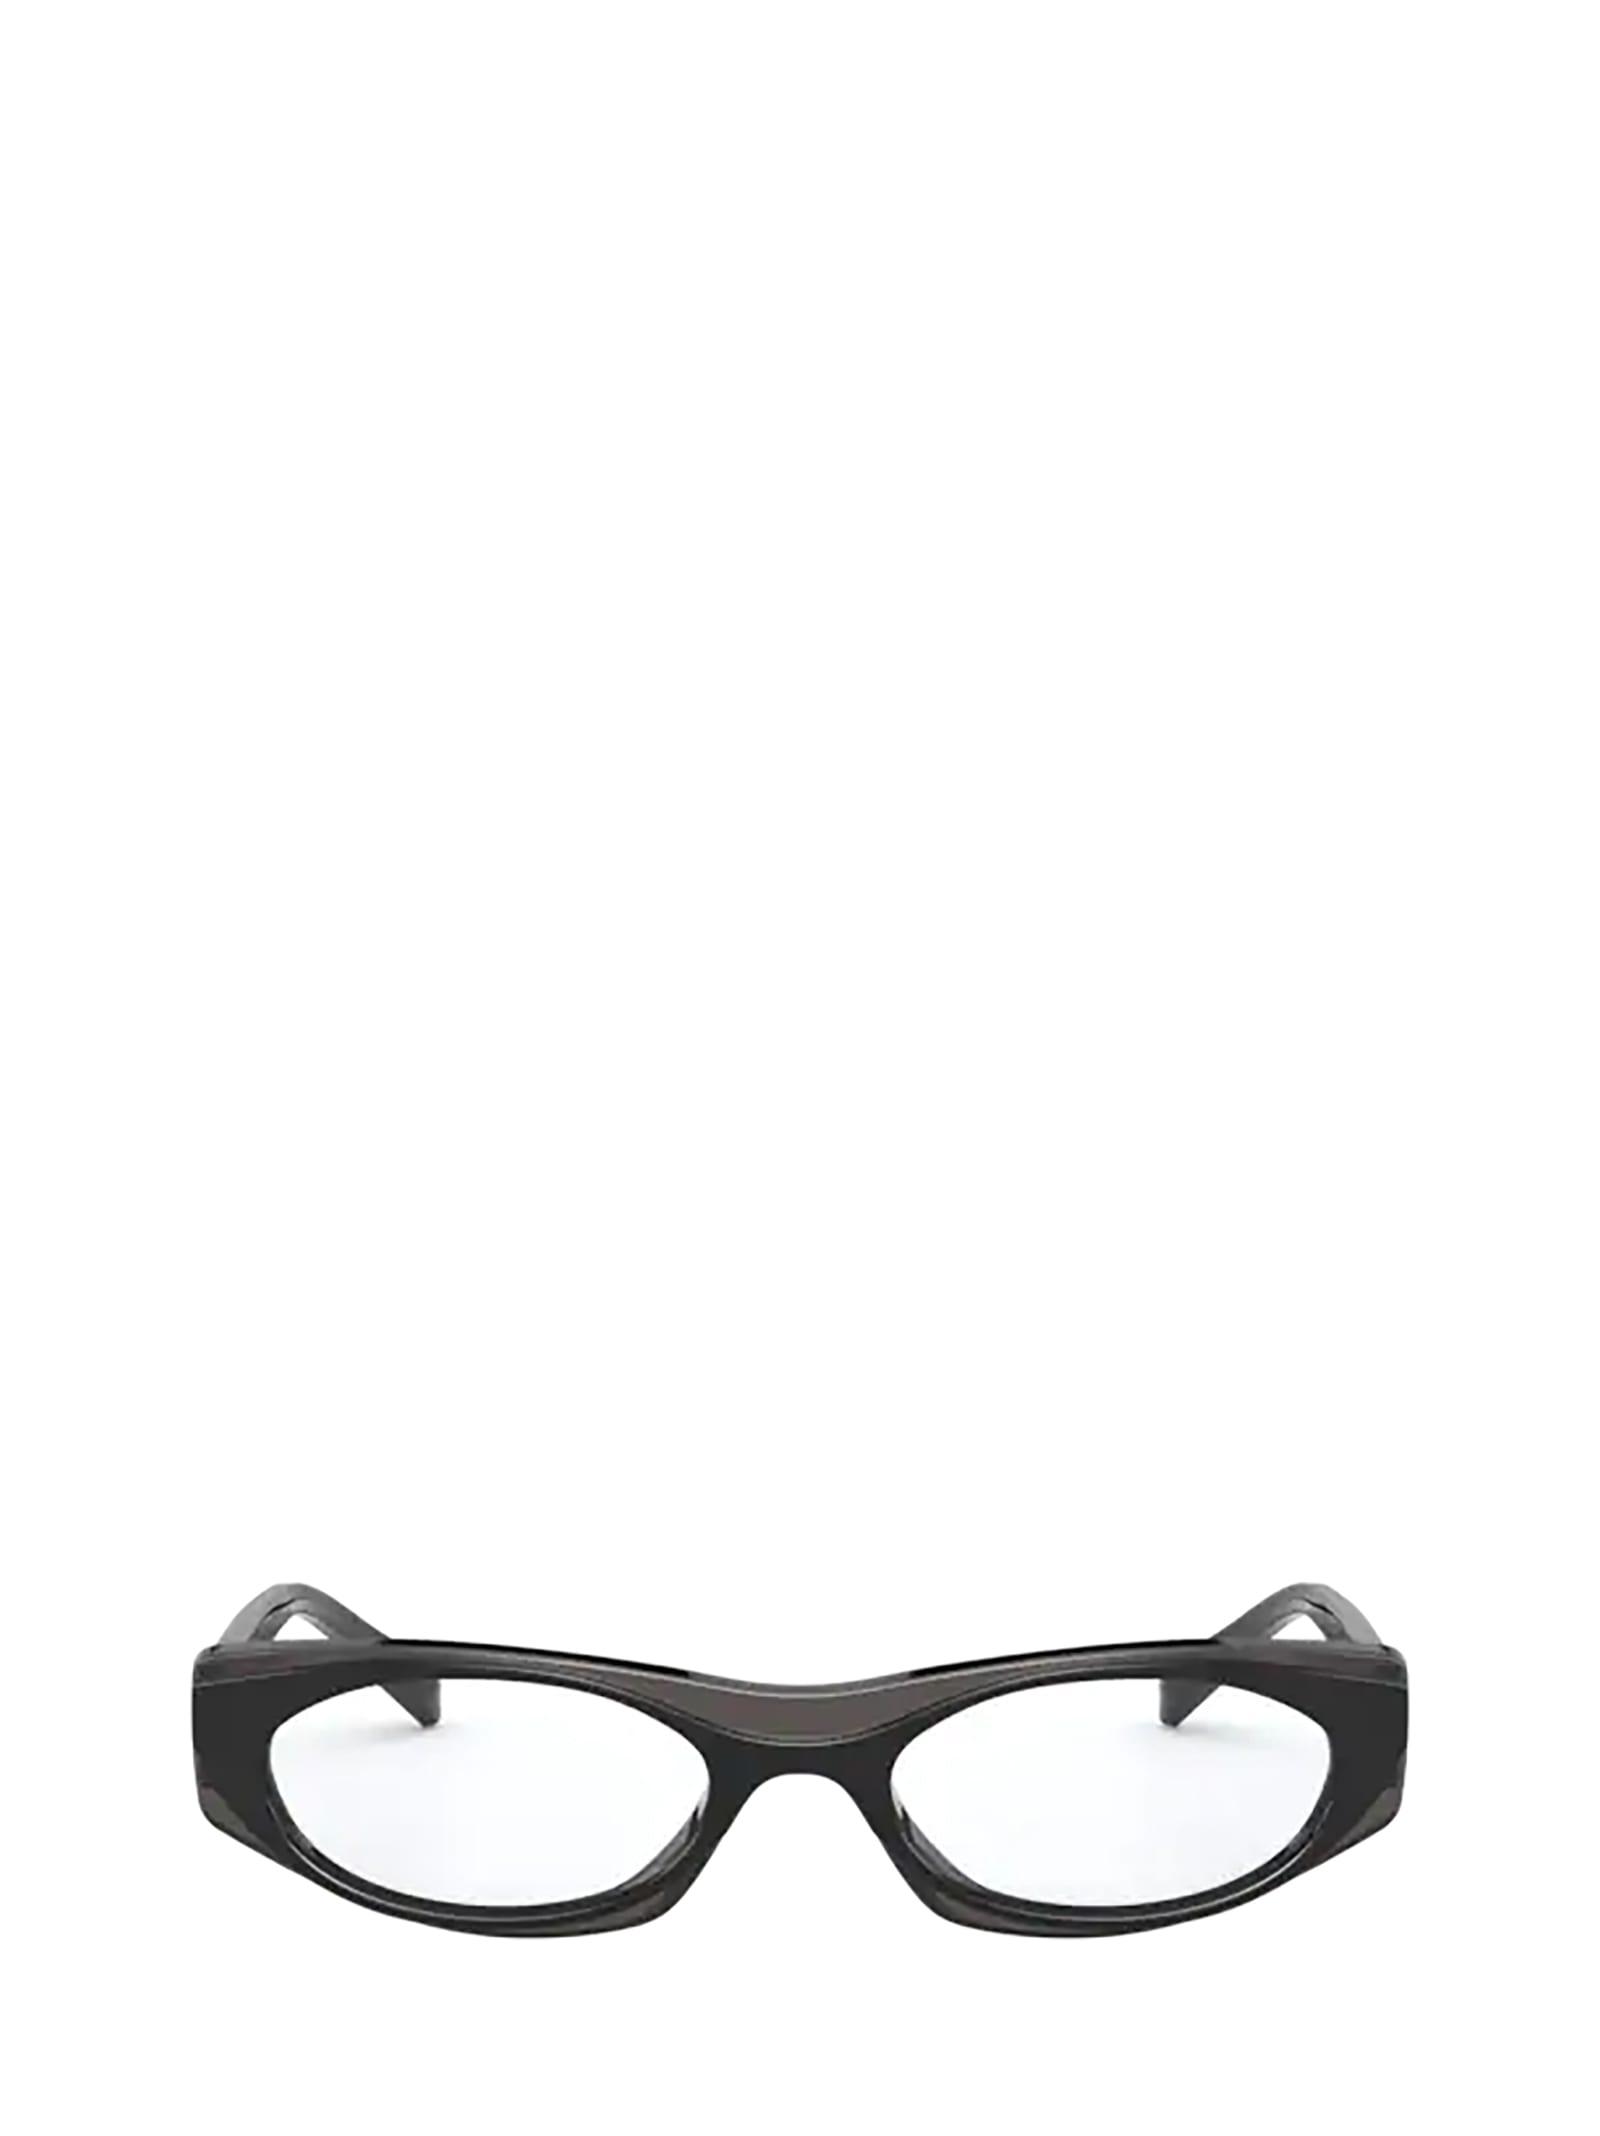 Vogue Eyewear Vogue Vo5316 Top Black / Opal Black Glasses